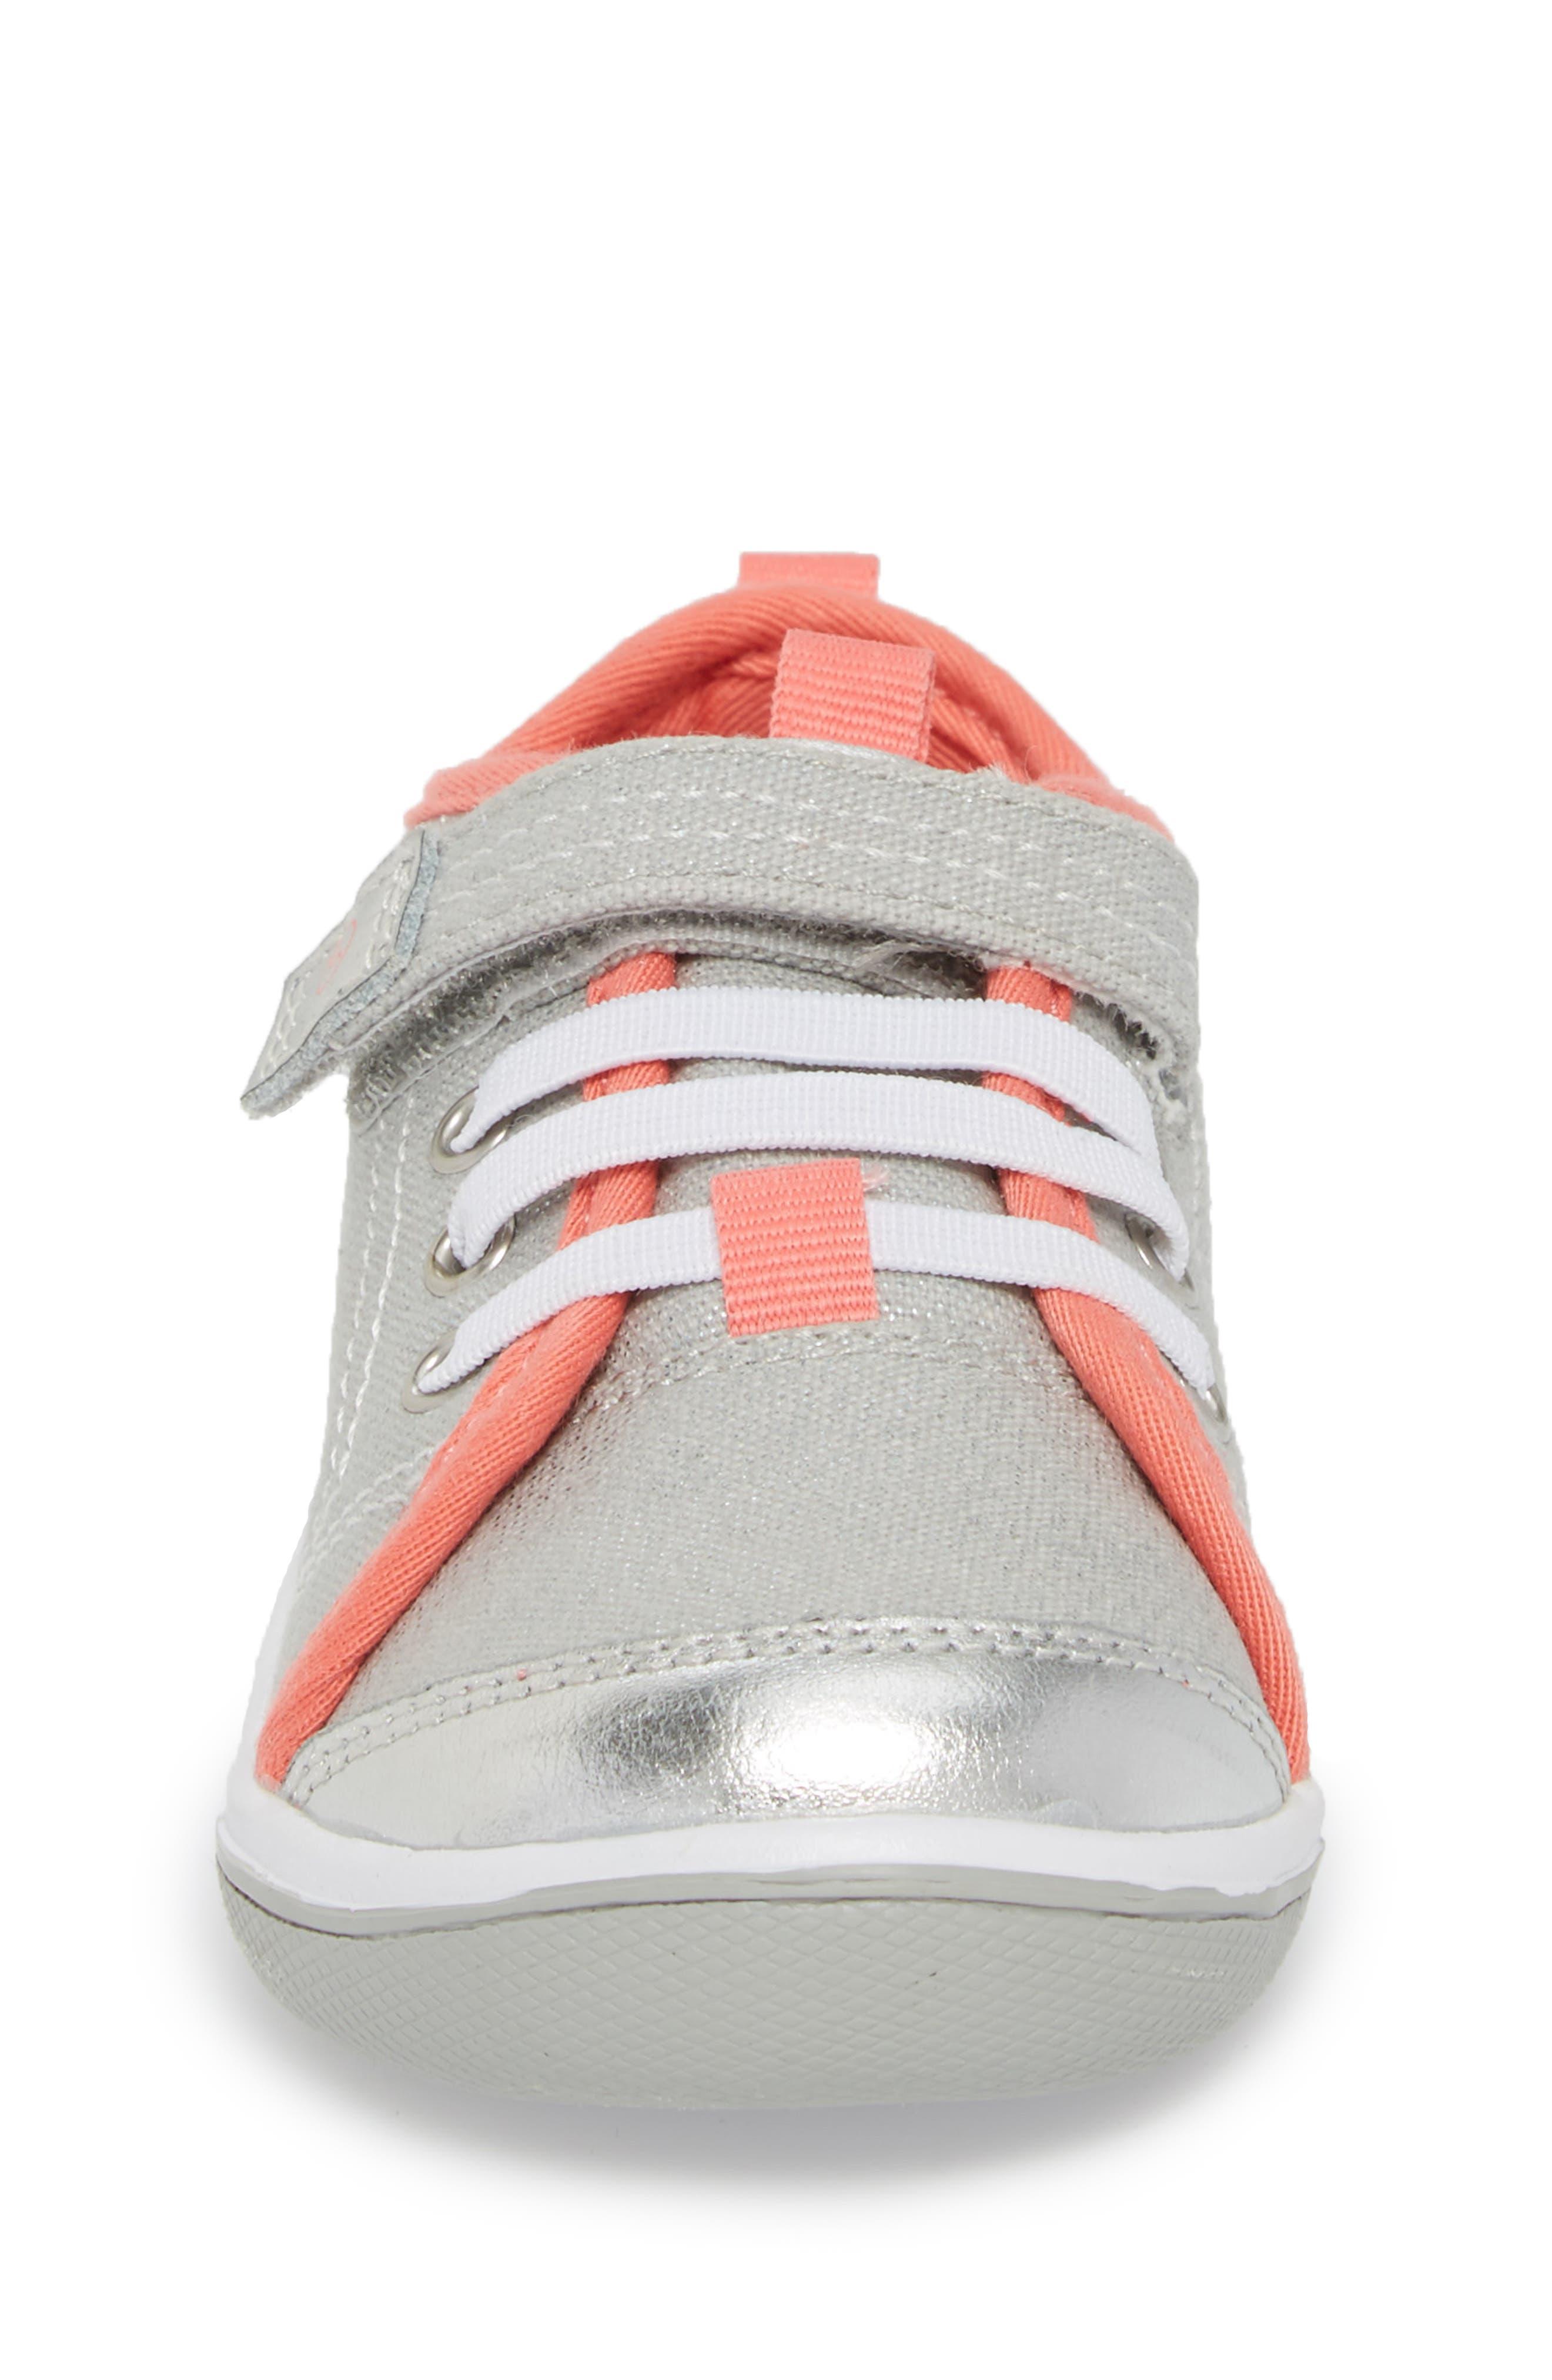 Dakota Sneaker,                             Alternate thumbnail 4, color,                             LIGHT GREY CANVAS